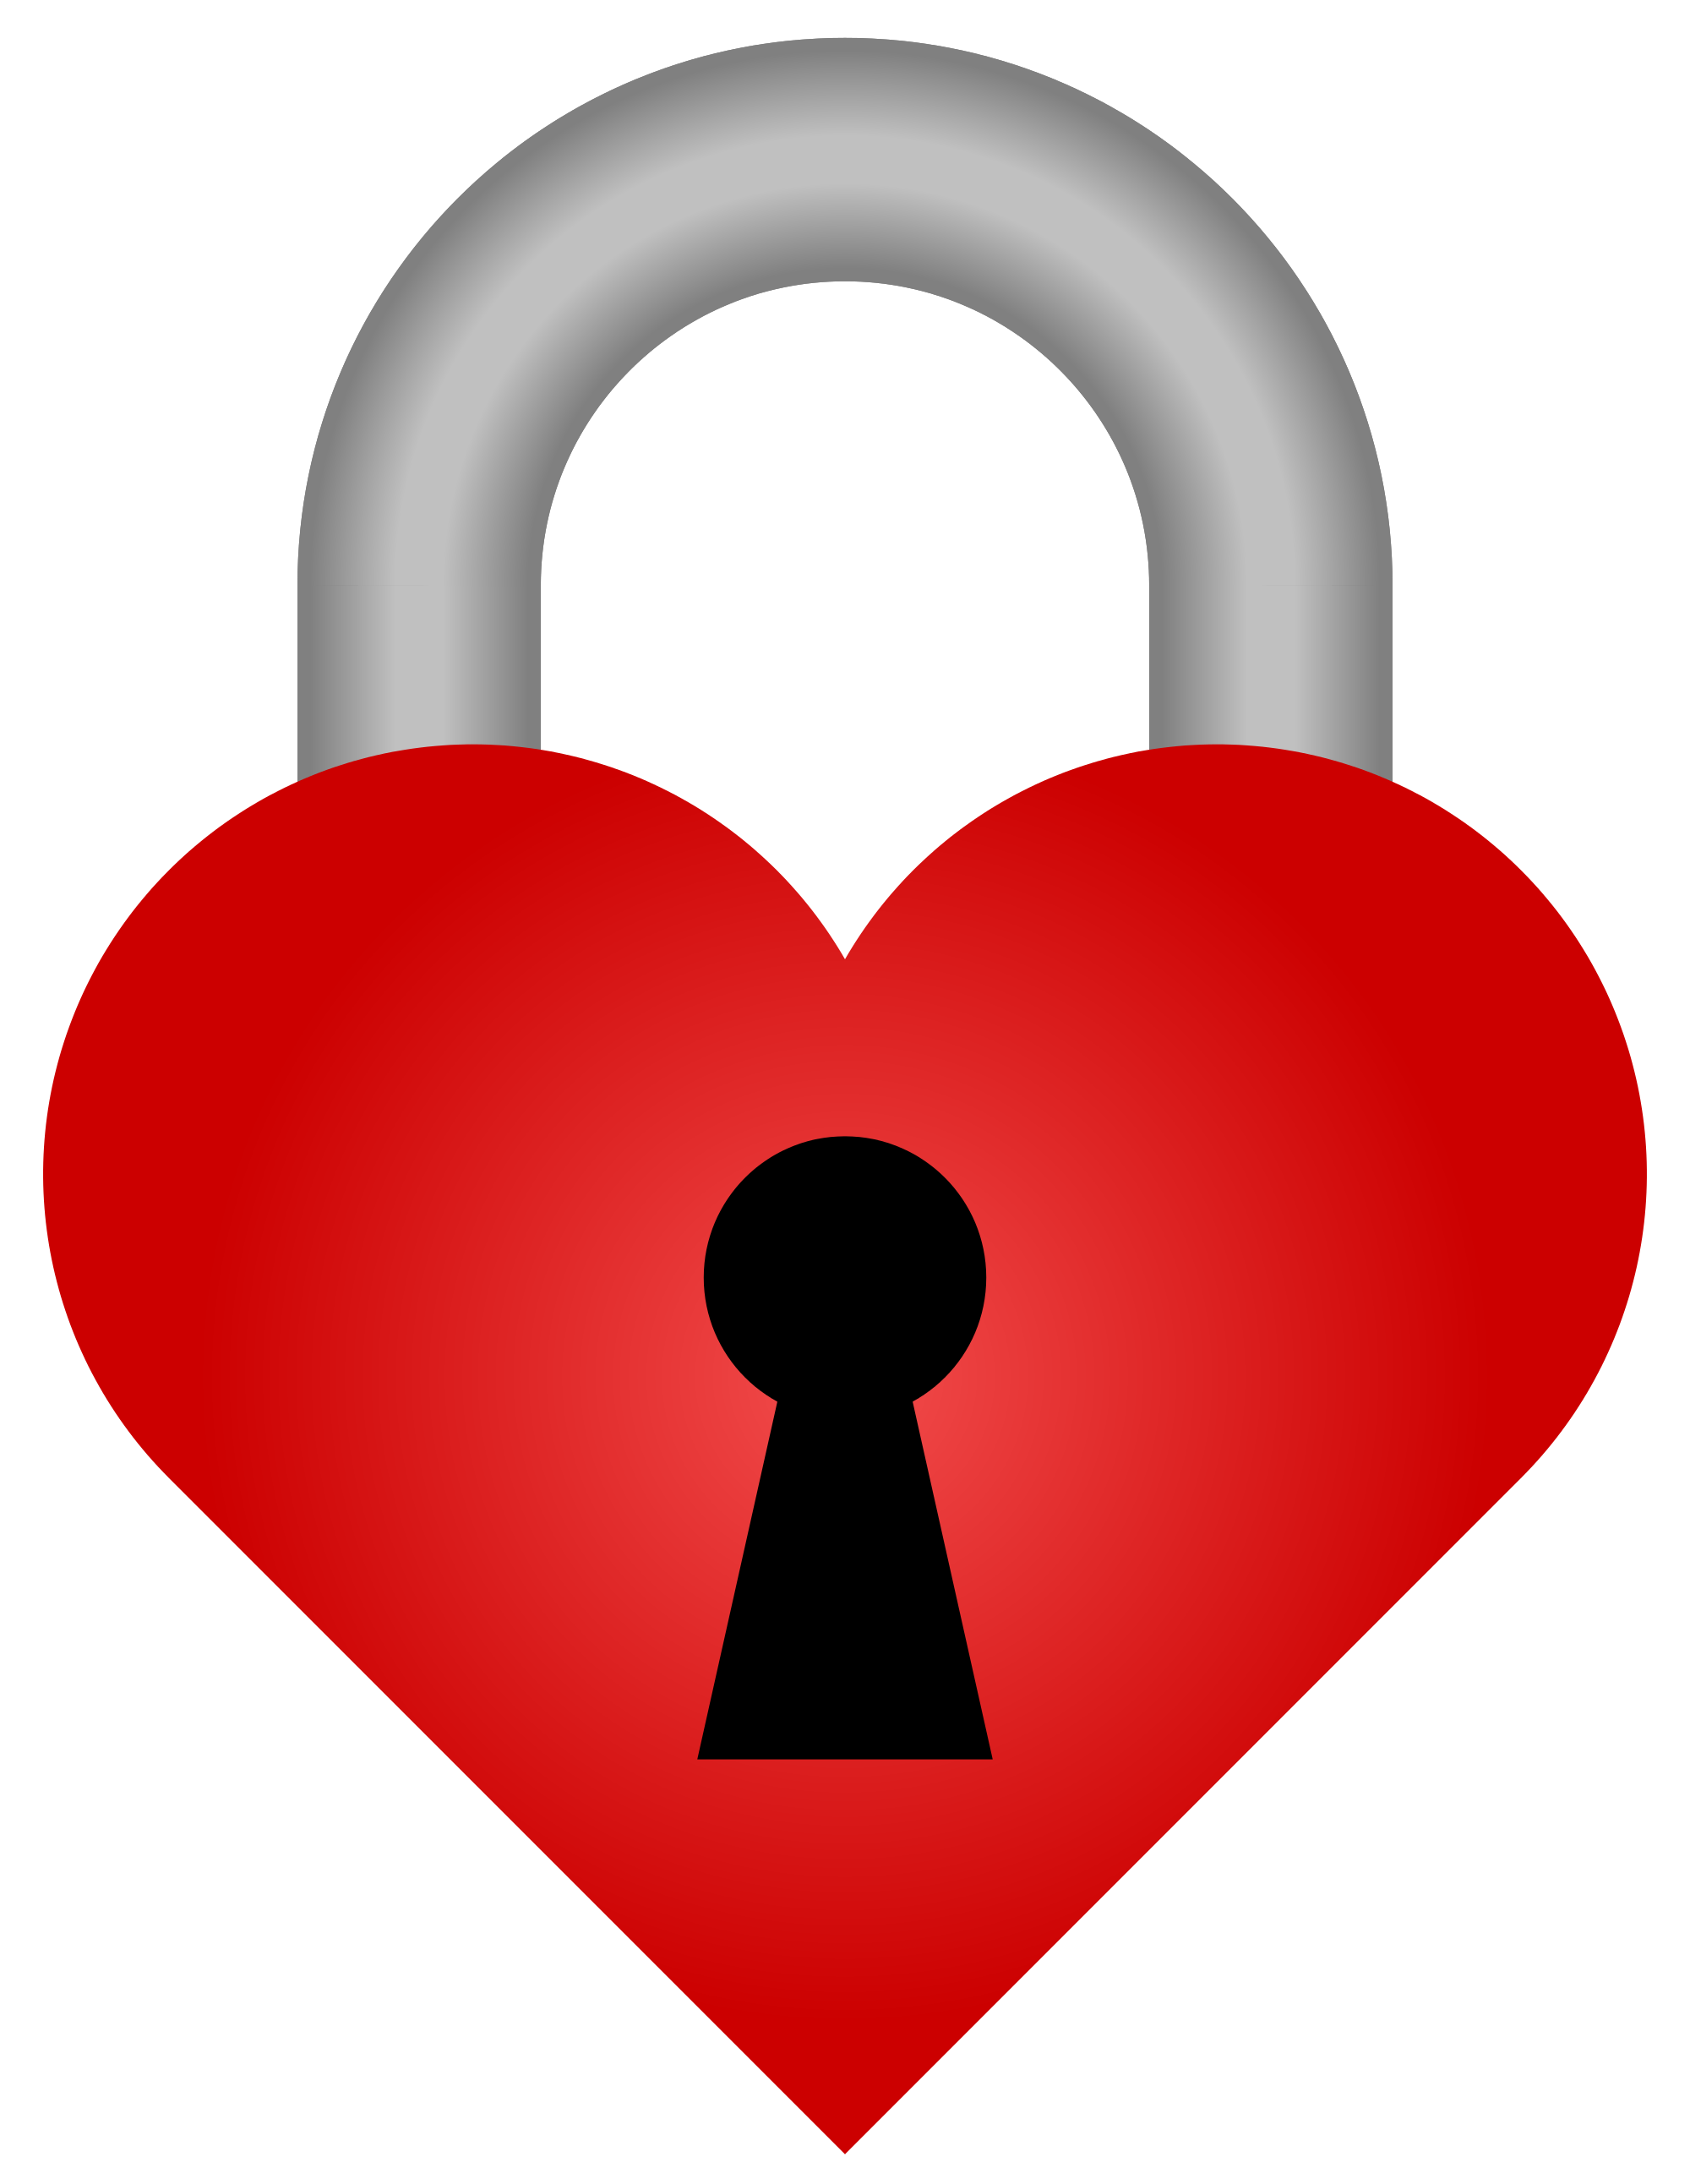 Heart-shaped clipart padlock Svg Open Wikimedia File:Heart Commons